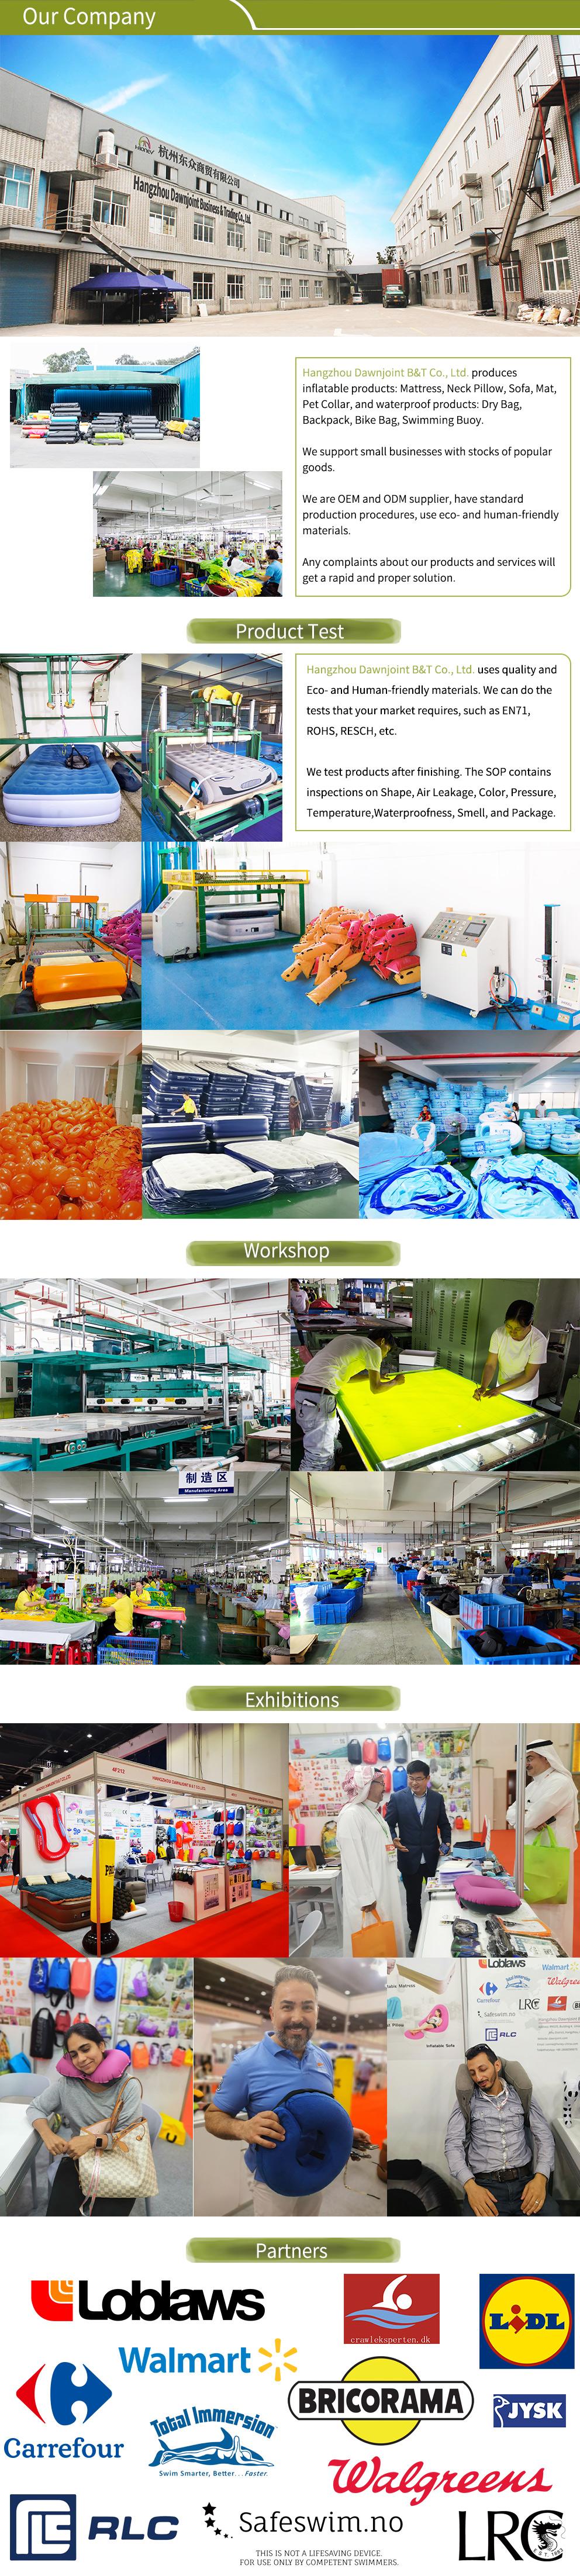 05-Our-Company.jpg